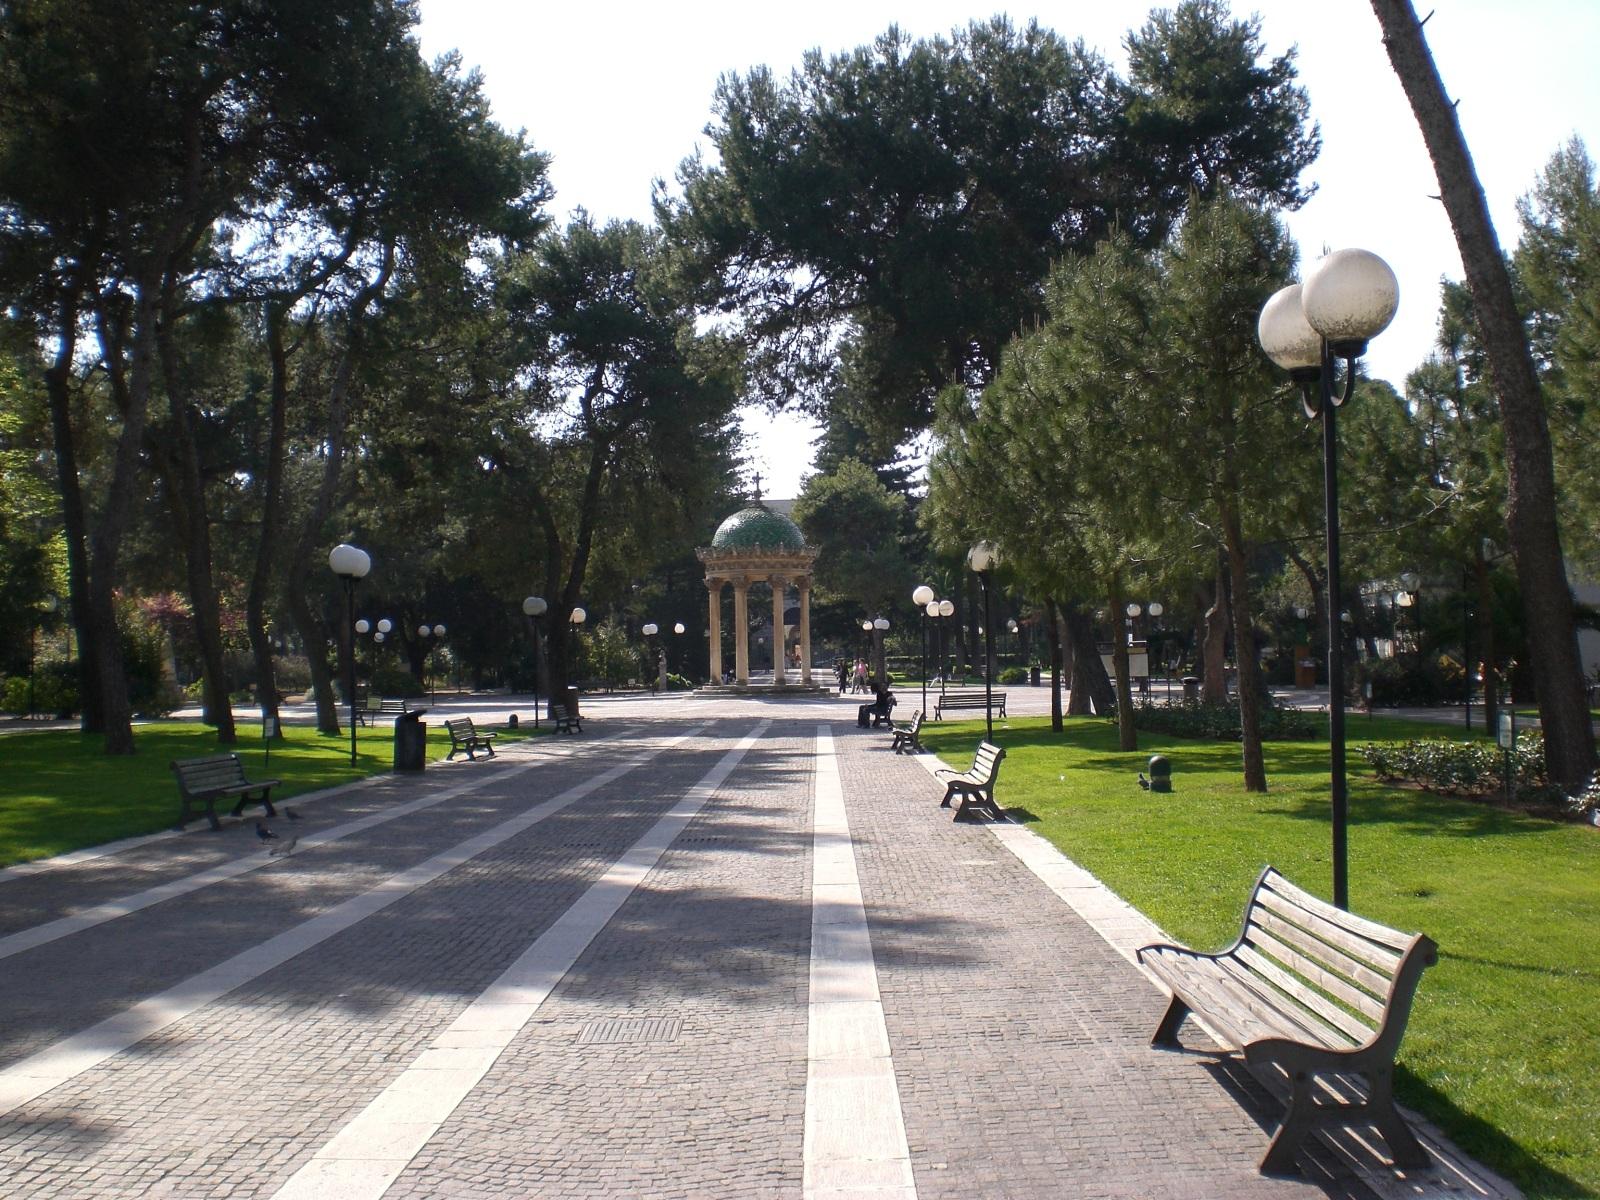 Villa Comunale Di Casoria Orari Di Apertura